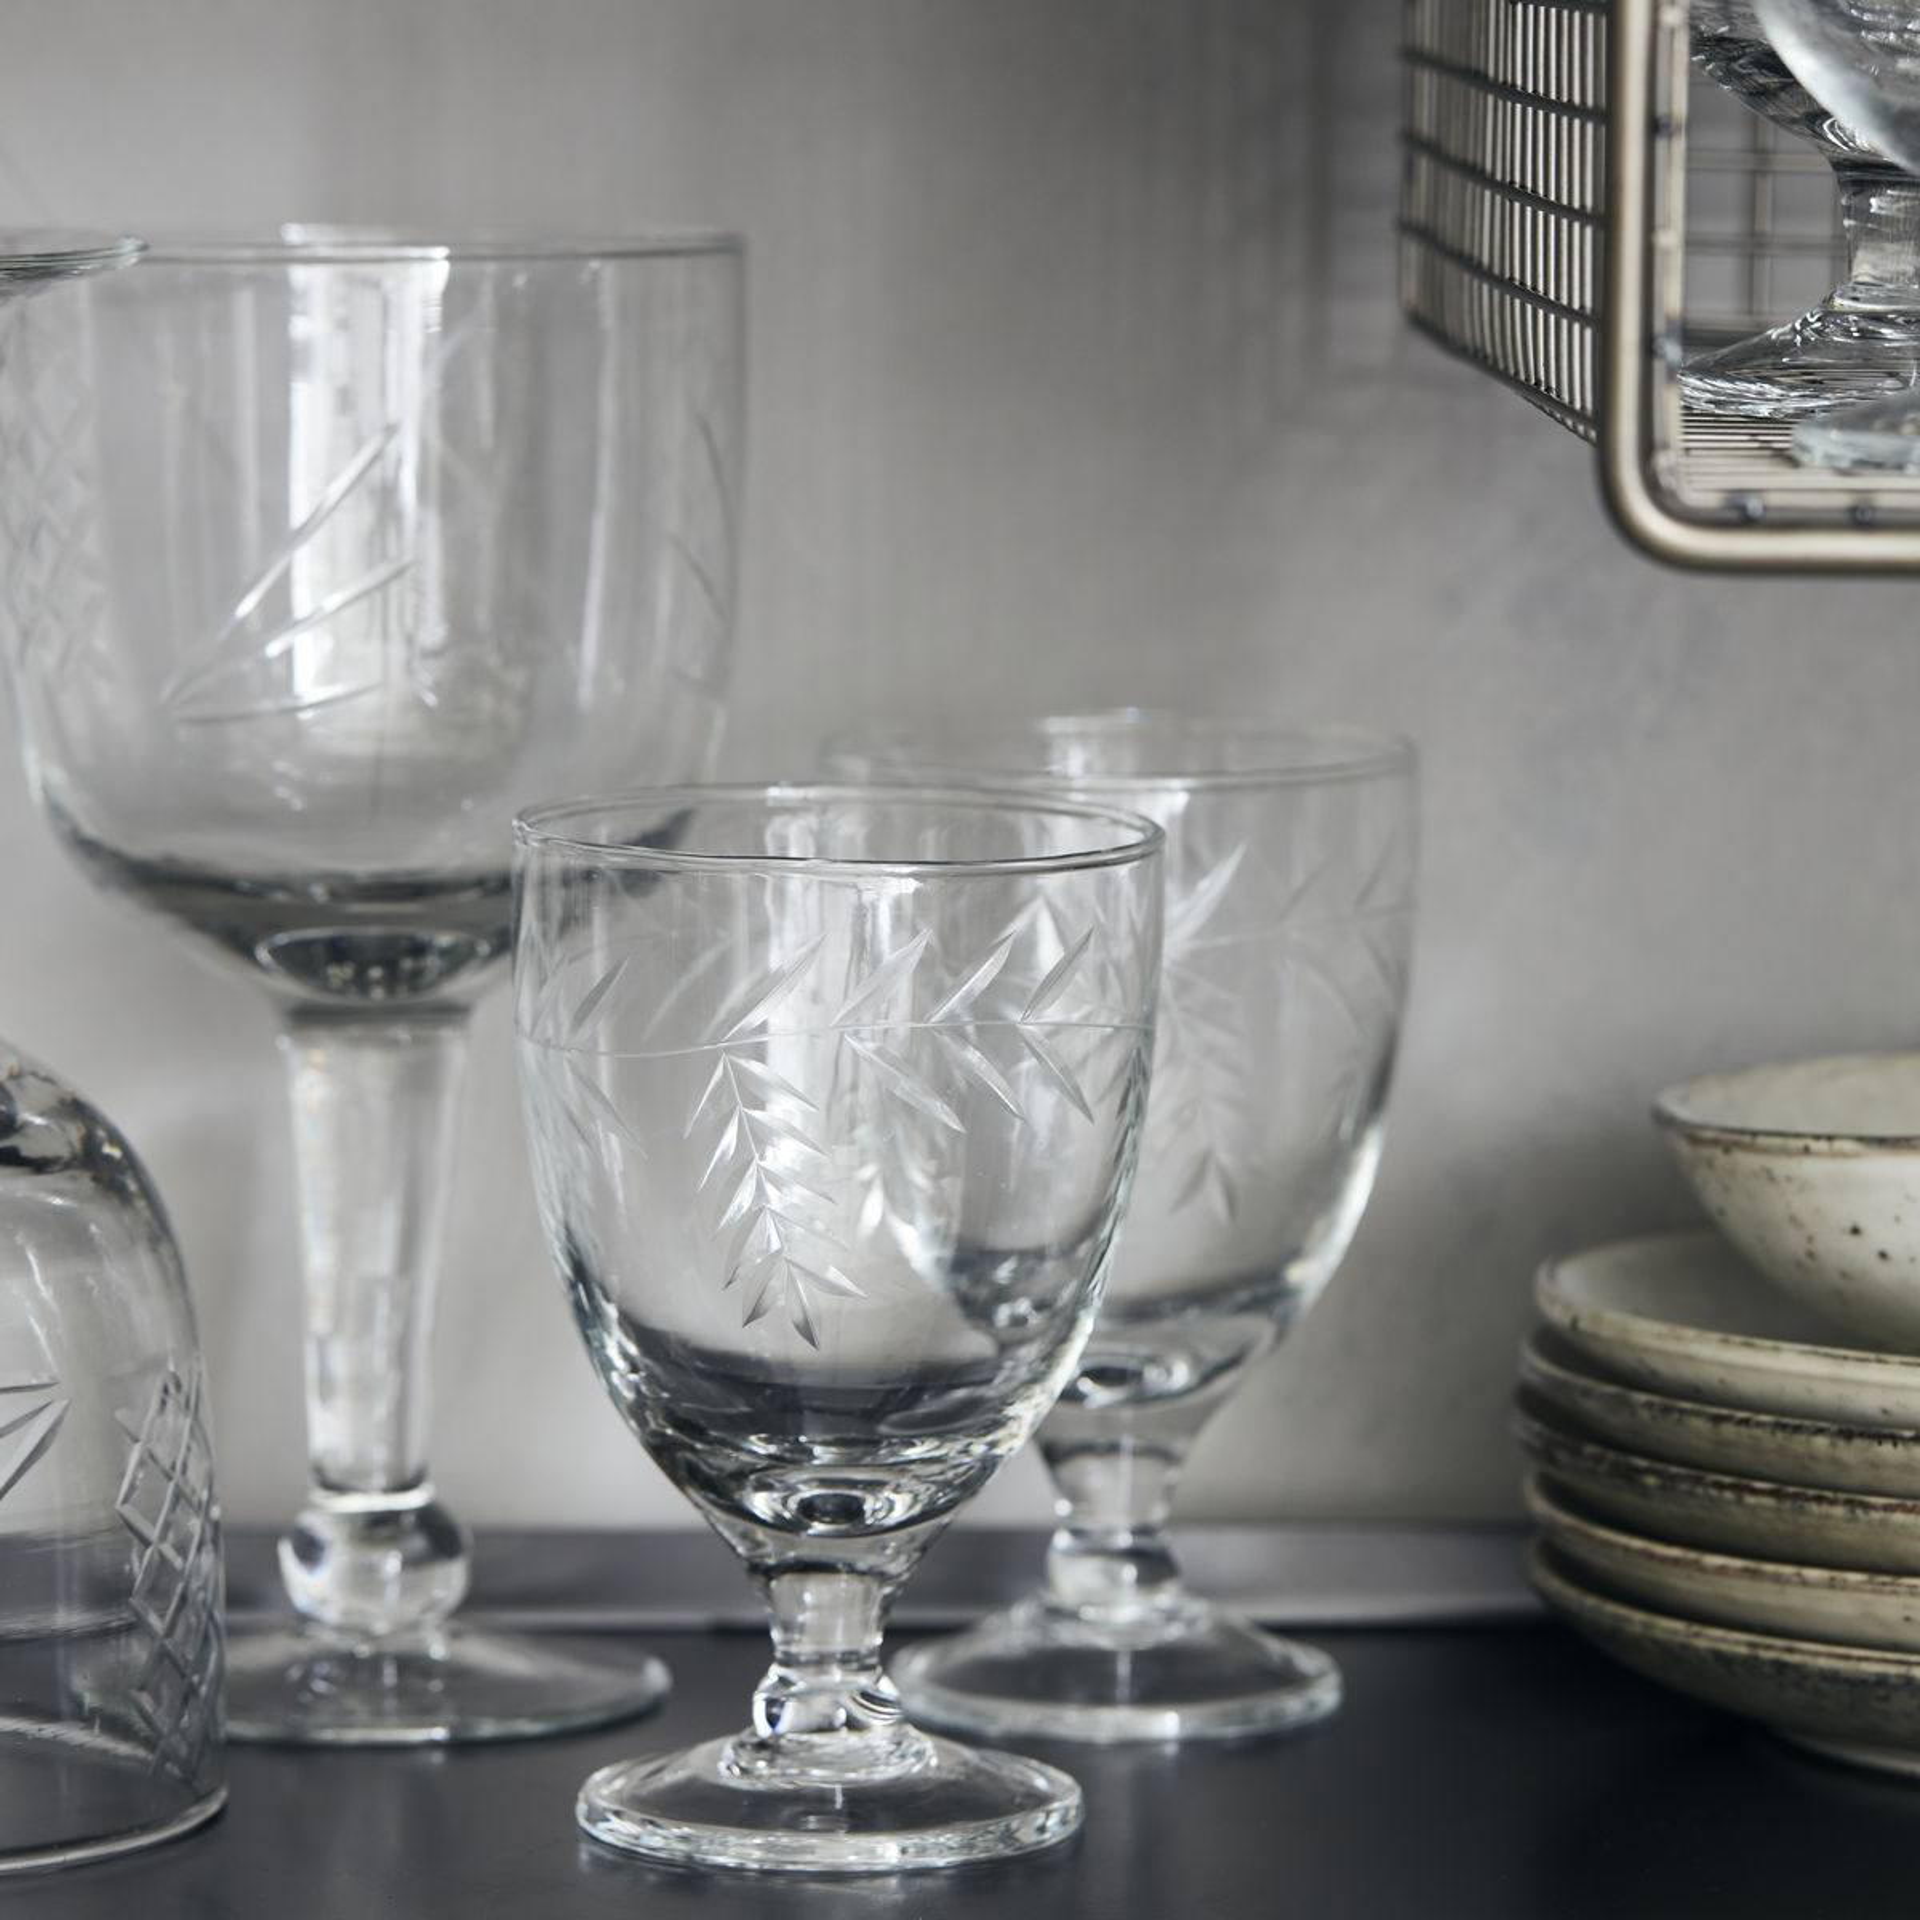 House Doctor Sklenice na víno Crys Clear, čirá barva, sklo